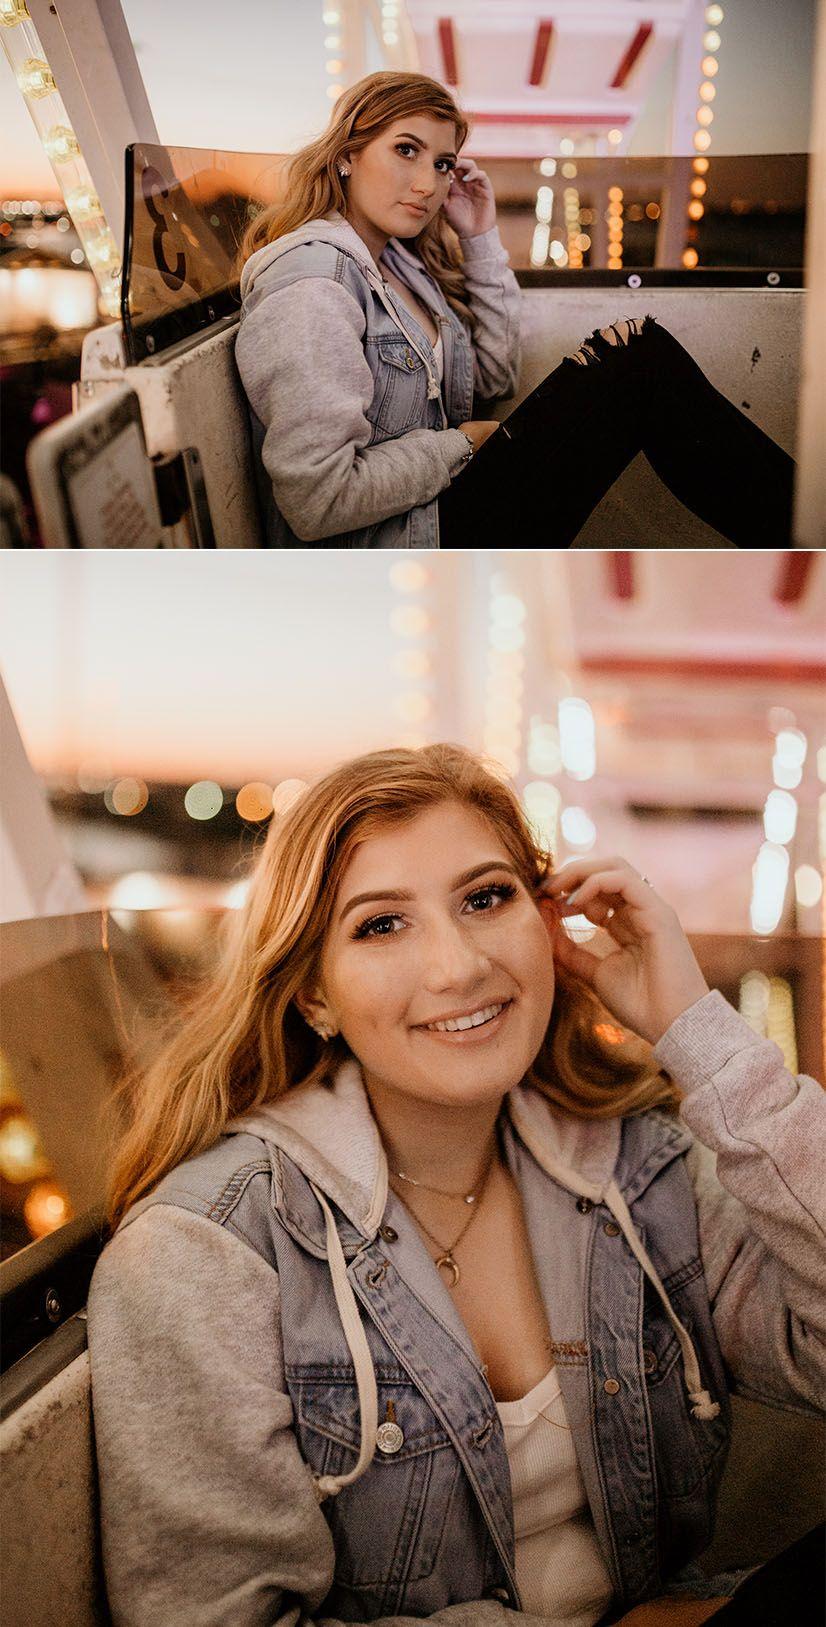 Kate Carmichael Photography Houston, Texas Senior